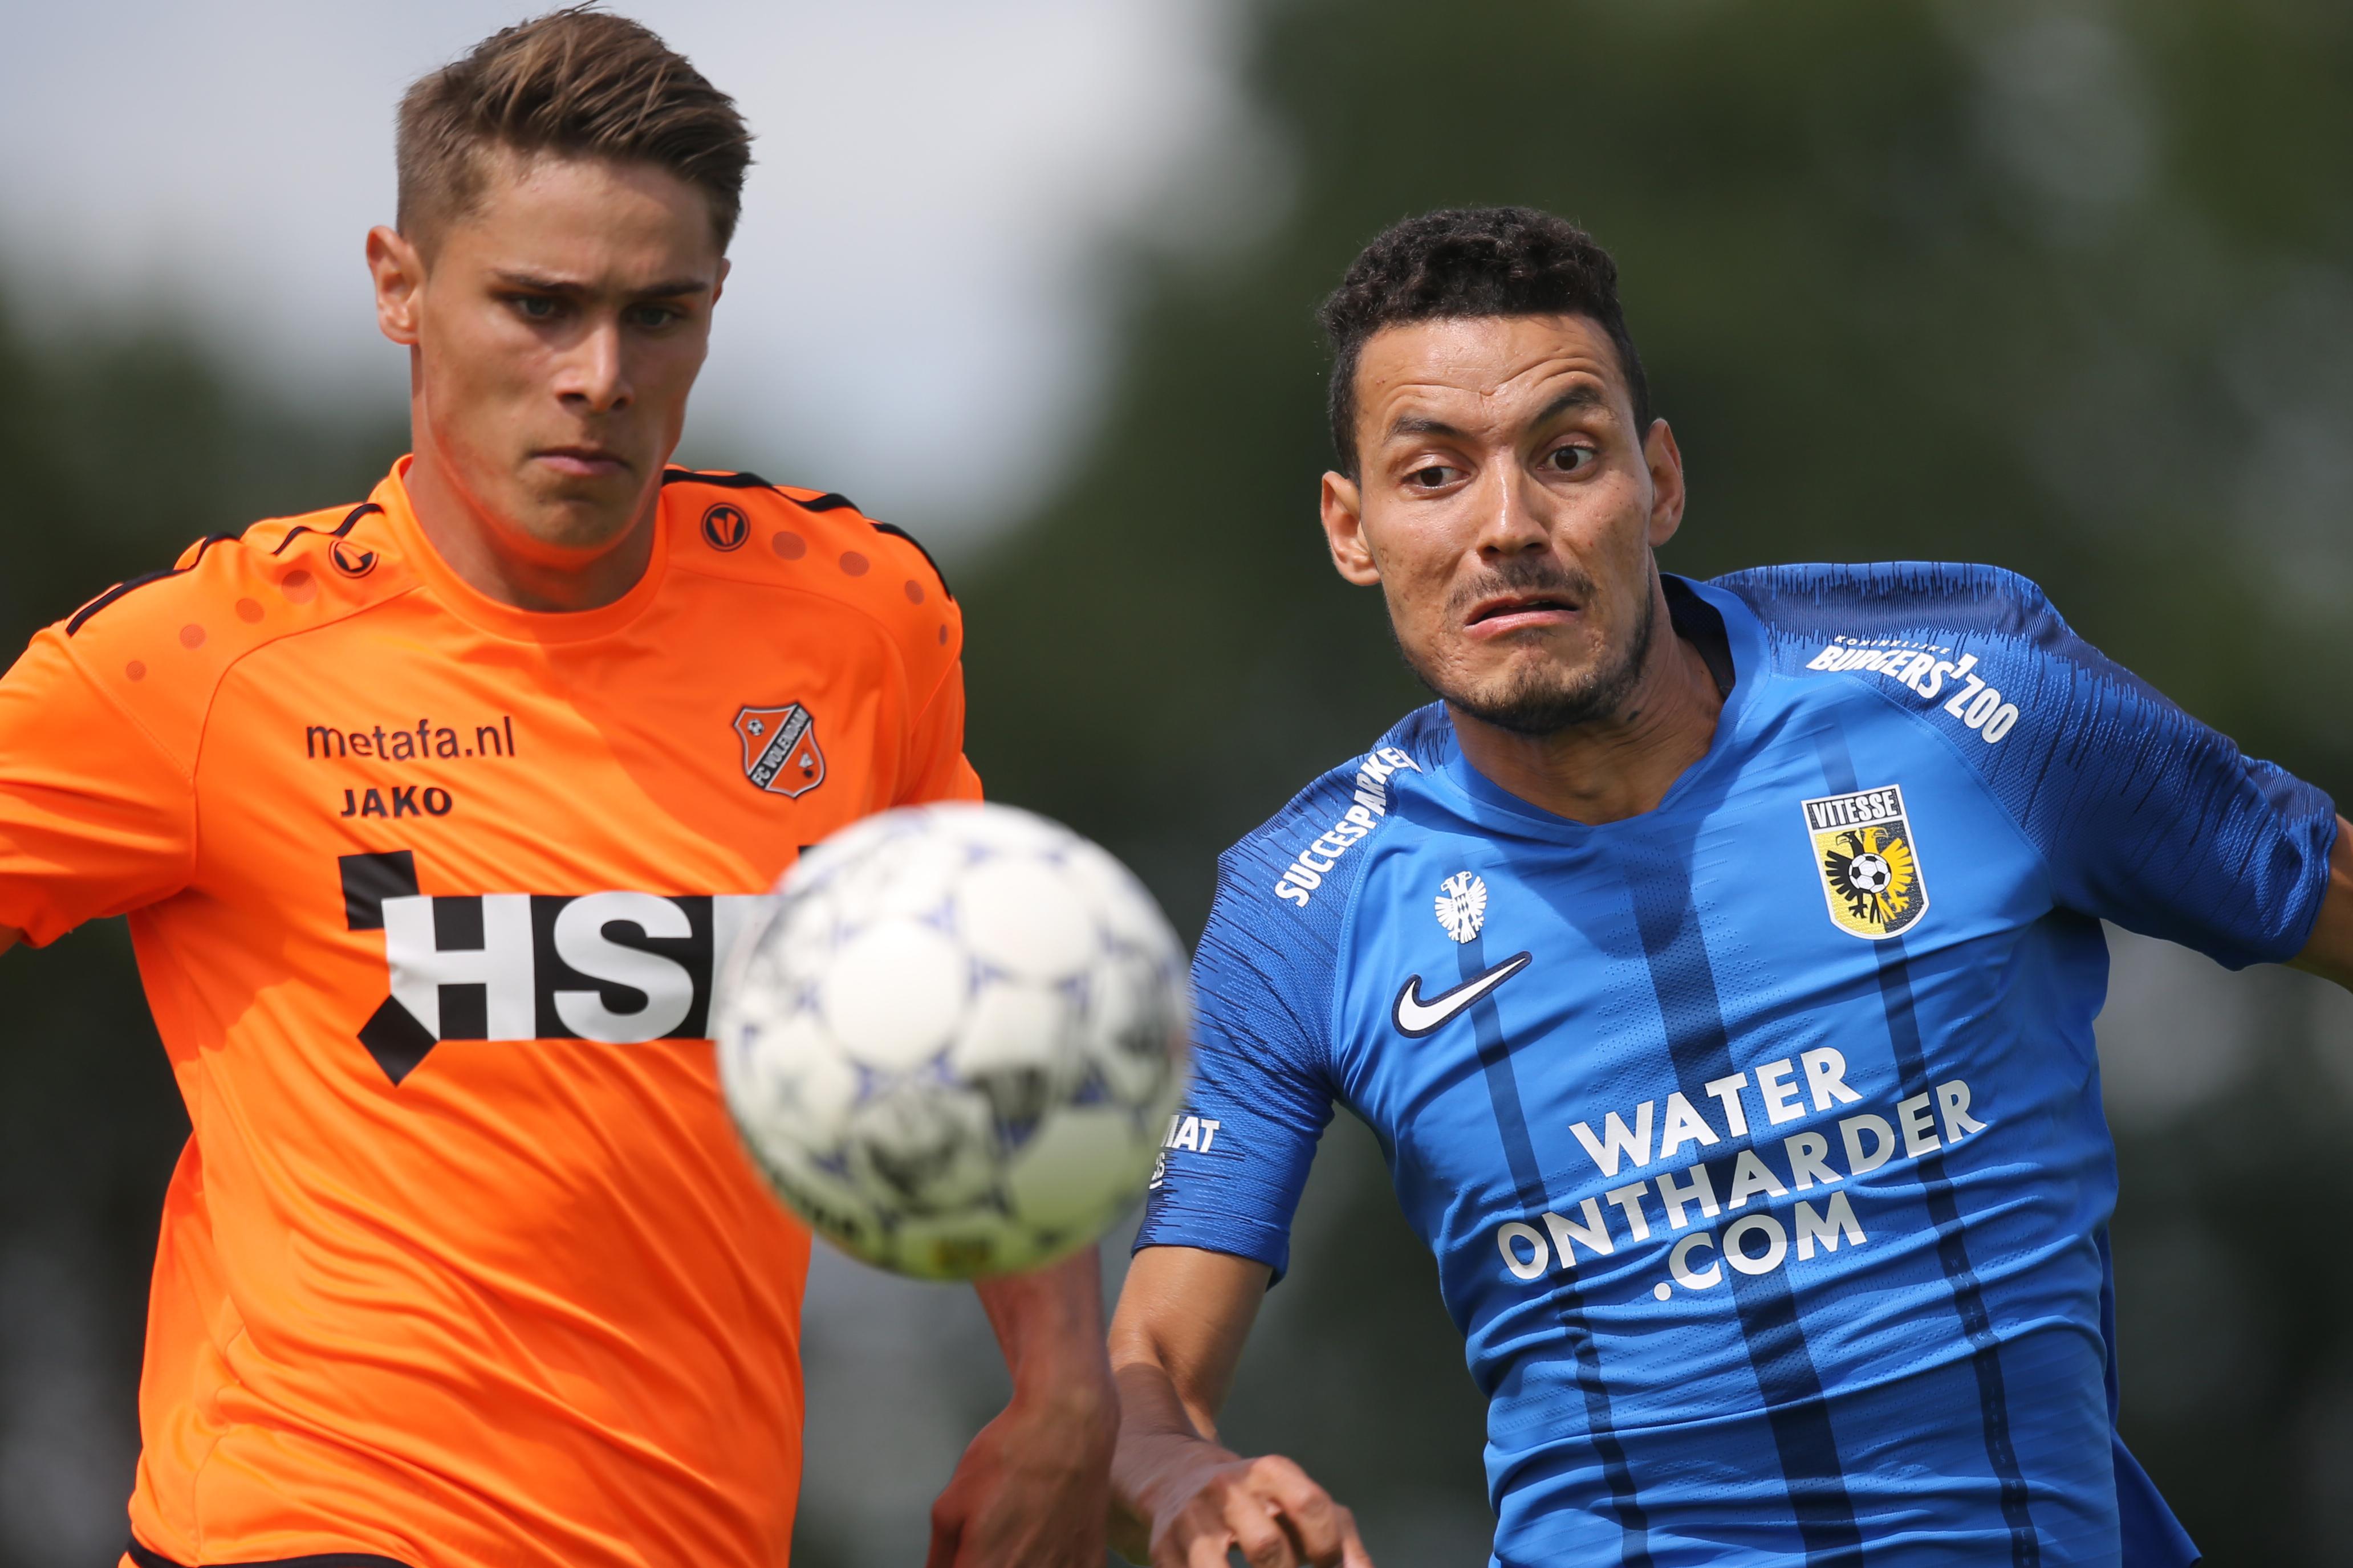 Volendam na sterke eerste helft toch stevig onderuit tegen Vitesse: 0-5